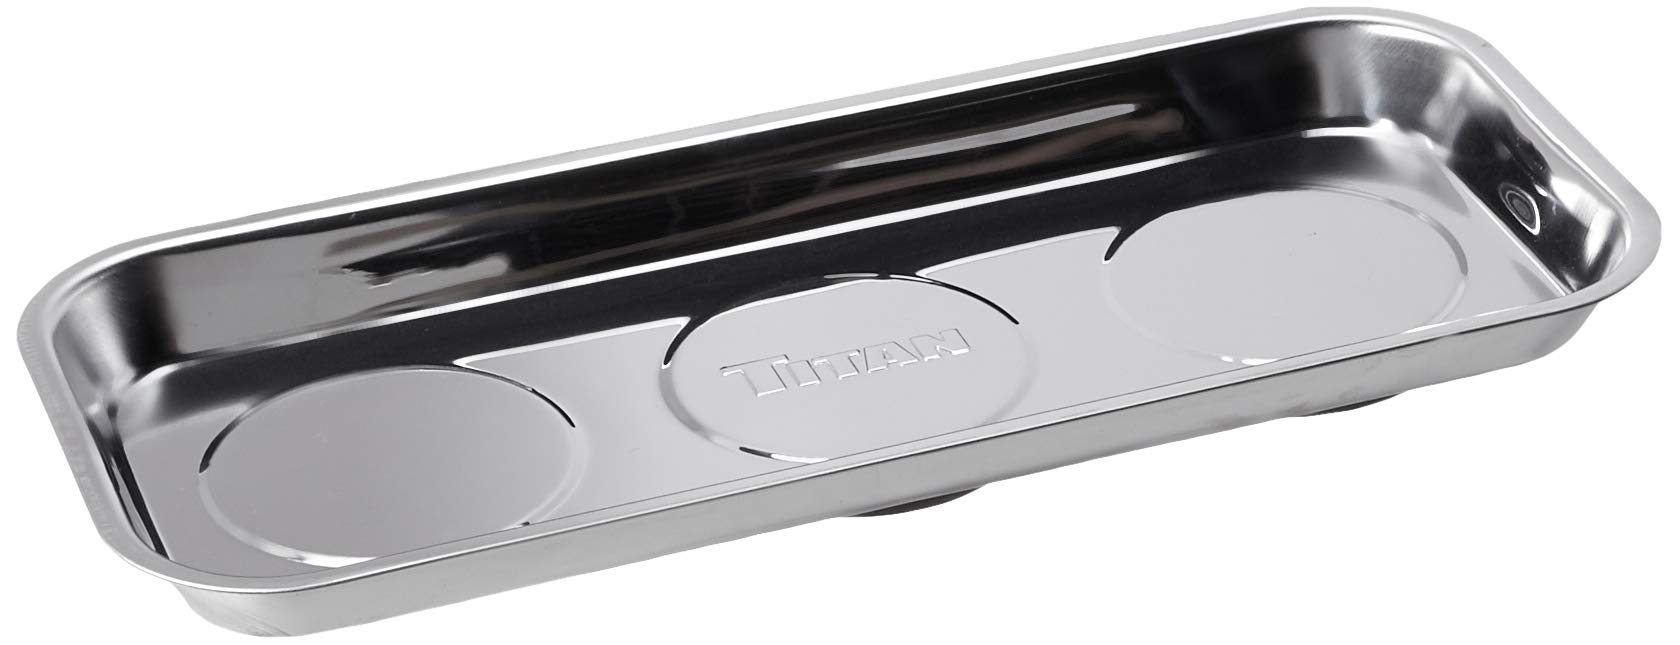 Titan Tools 21263 Rectangular Magnetic Parts Tray (6.5'' x 14'') by Titan Tools